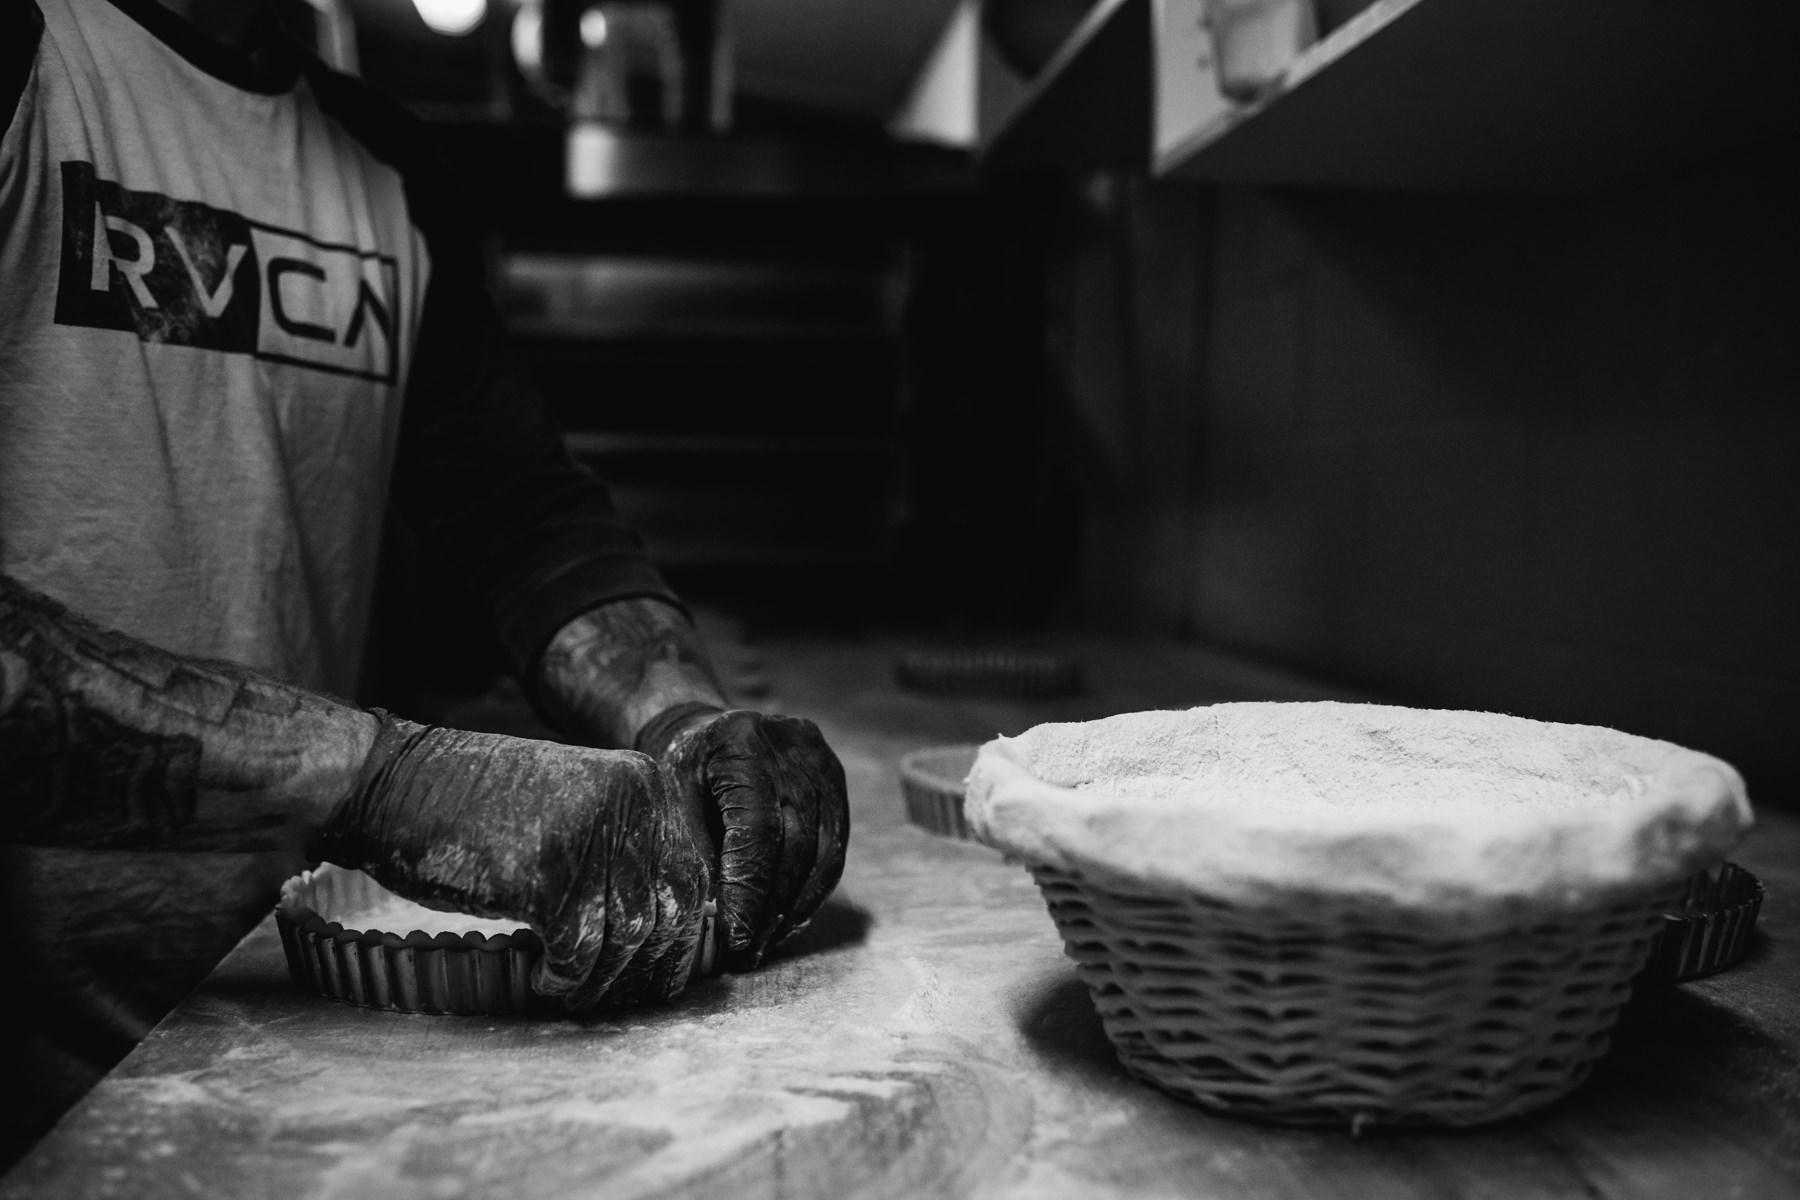 matt-tinder-saboteur-bakery-bremerton-wa-21